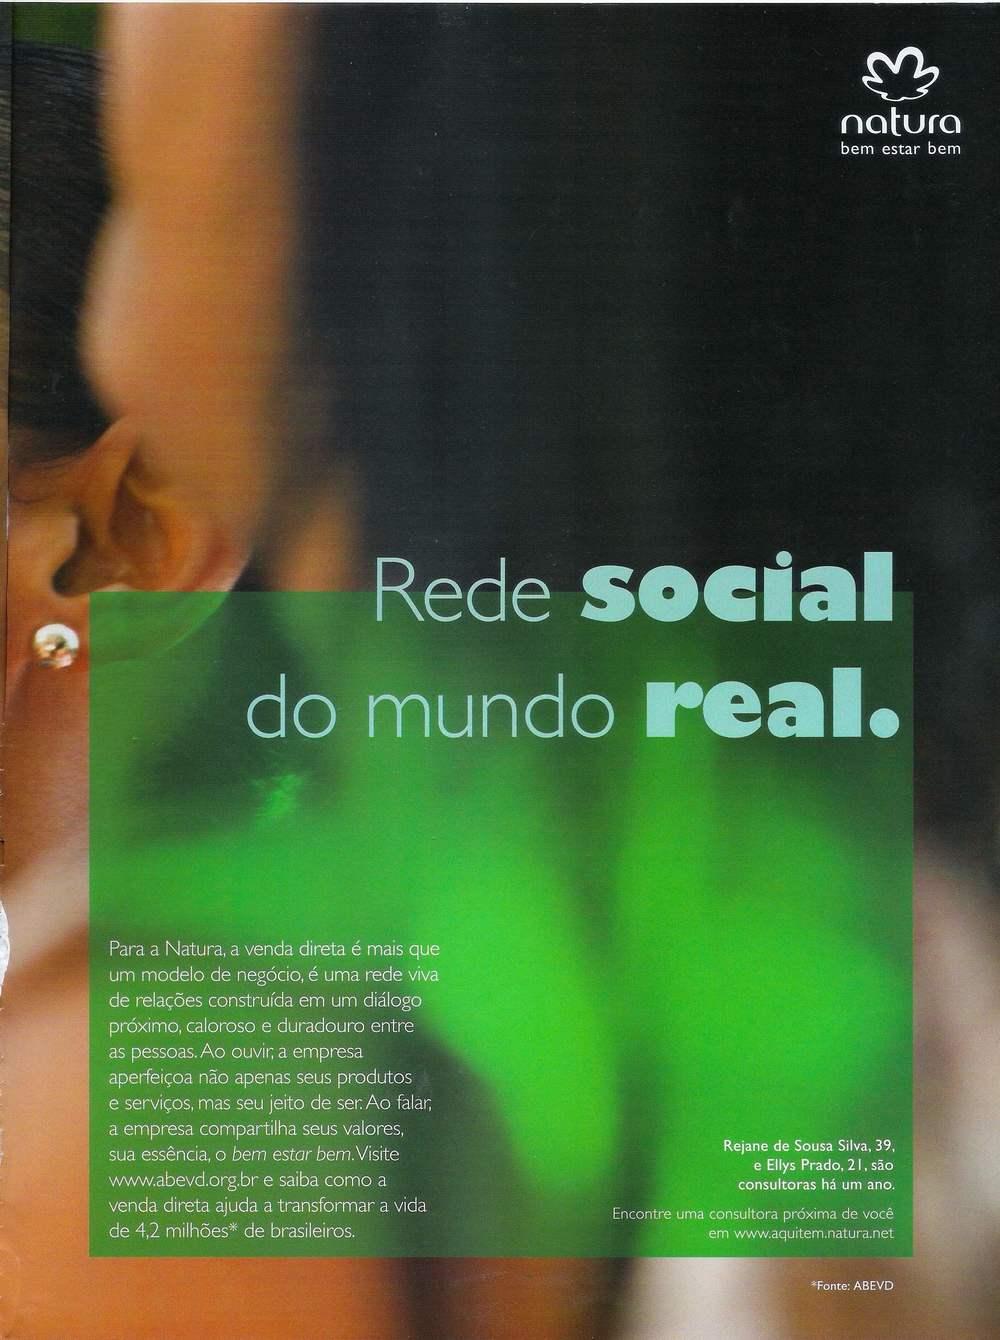 Natura Rede Social 1.jpg